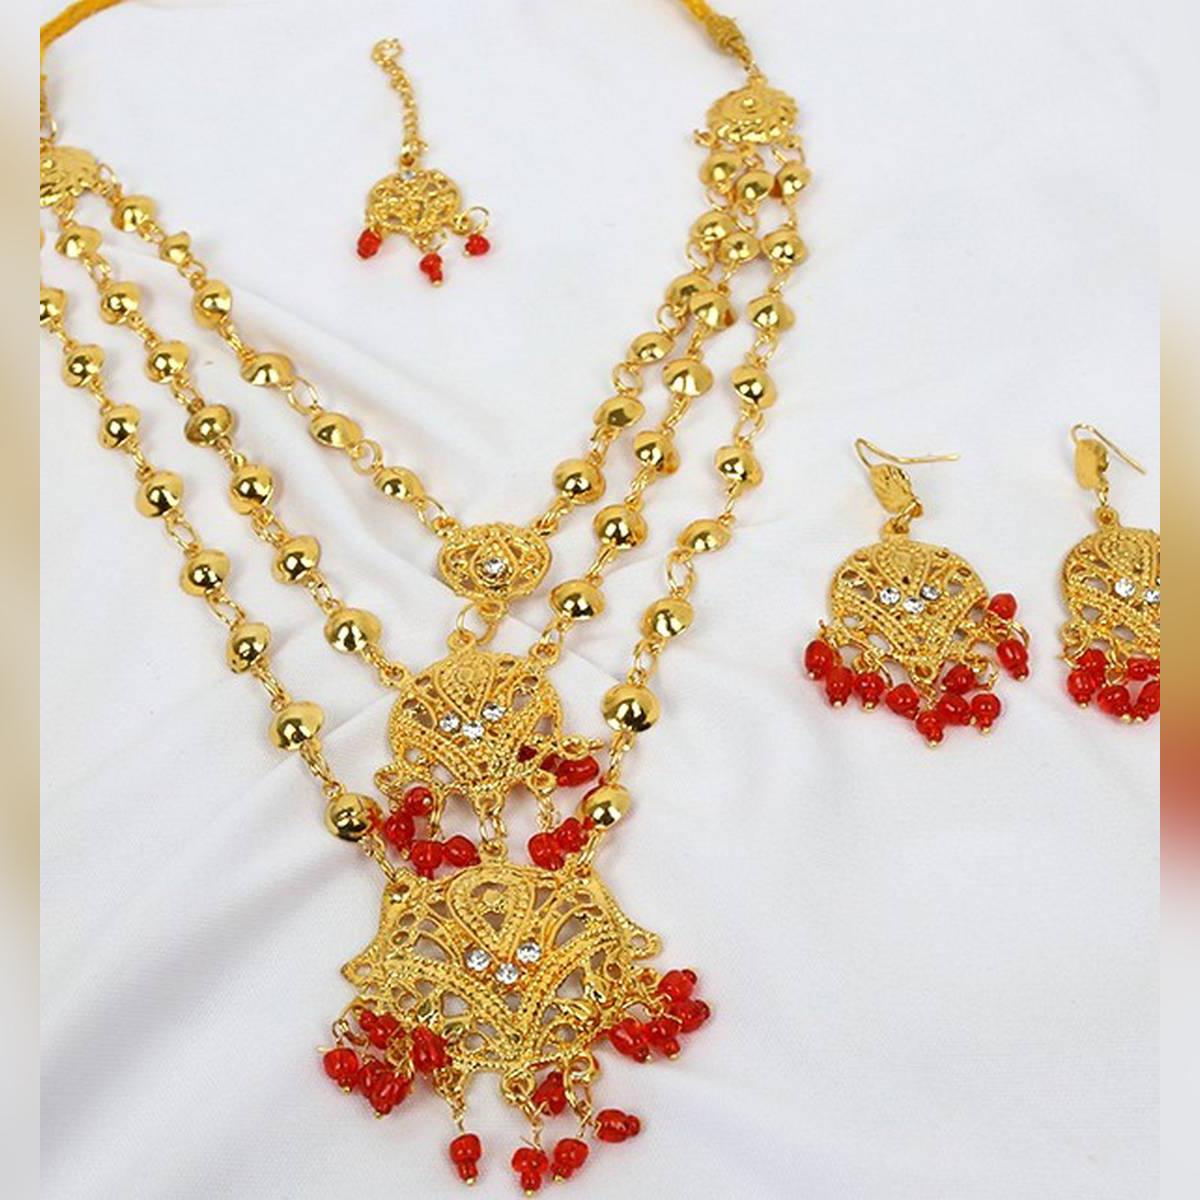 Artificial Bridal Jewelry Set - Jewellery Set for Girls / Women